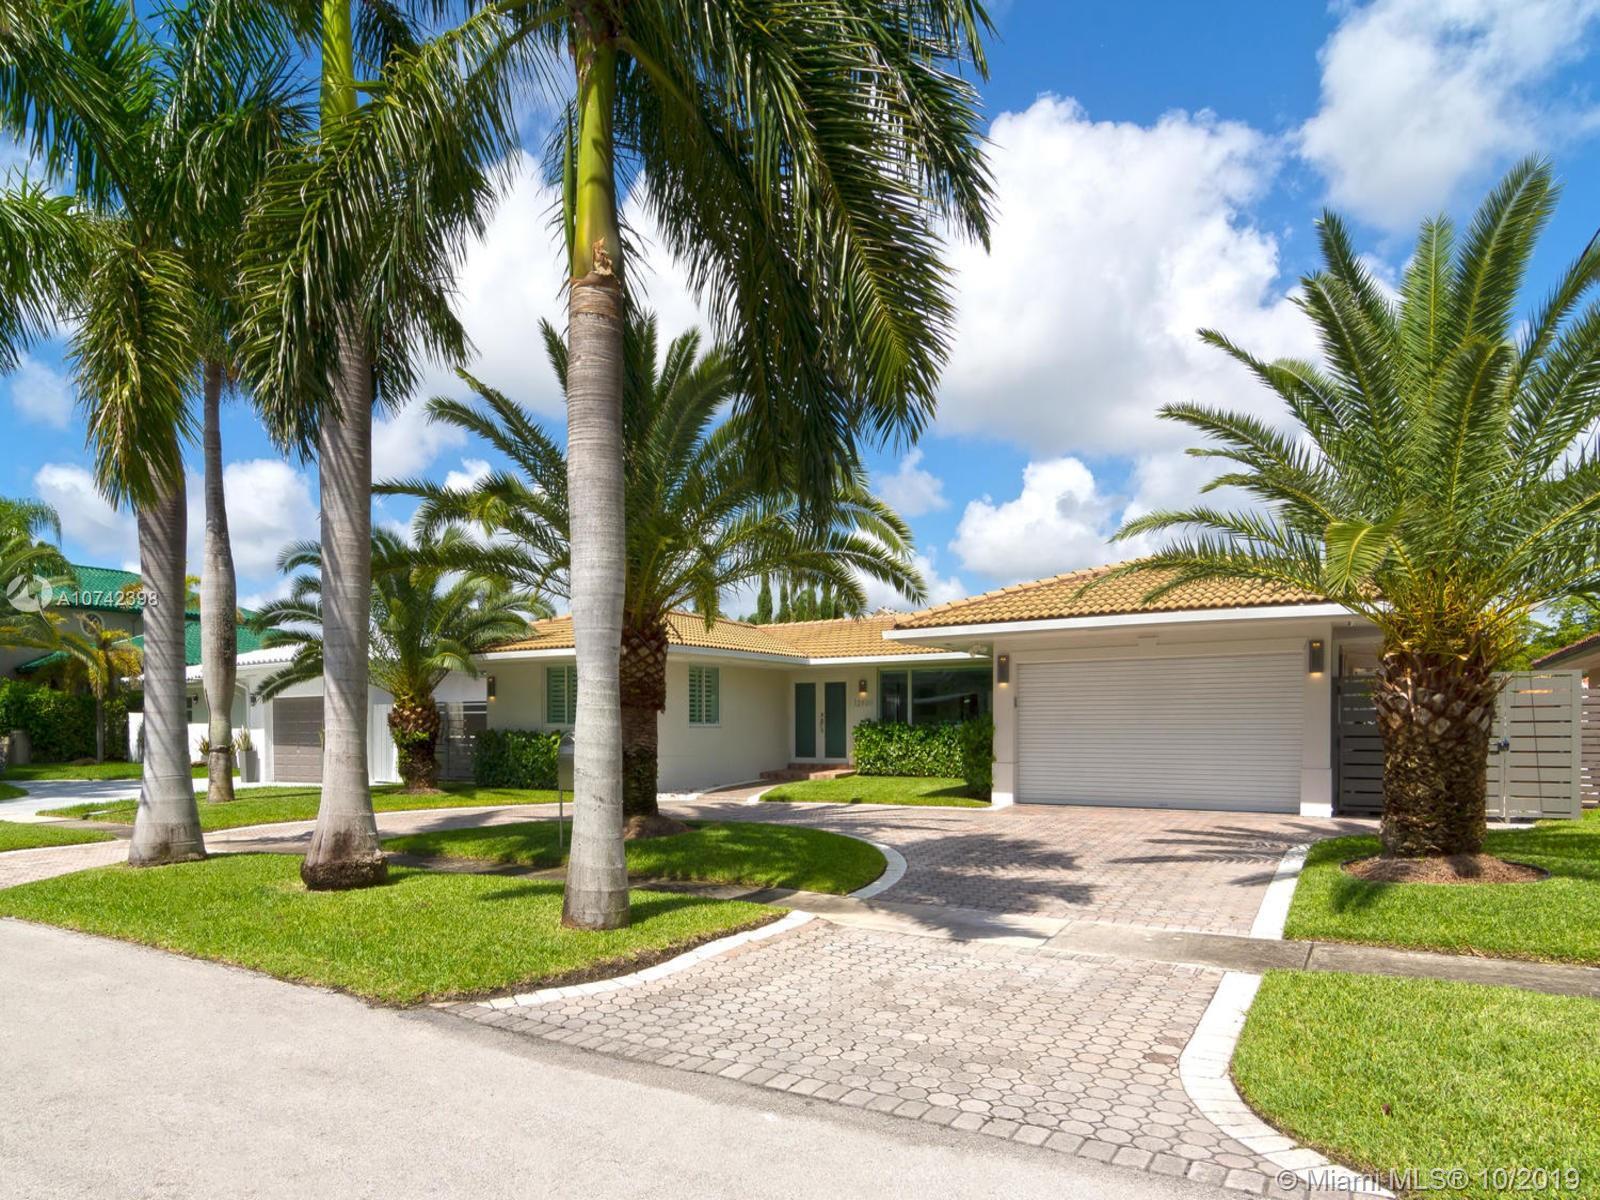 12930 Oleander Rd, North Miami FL 33181